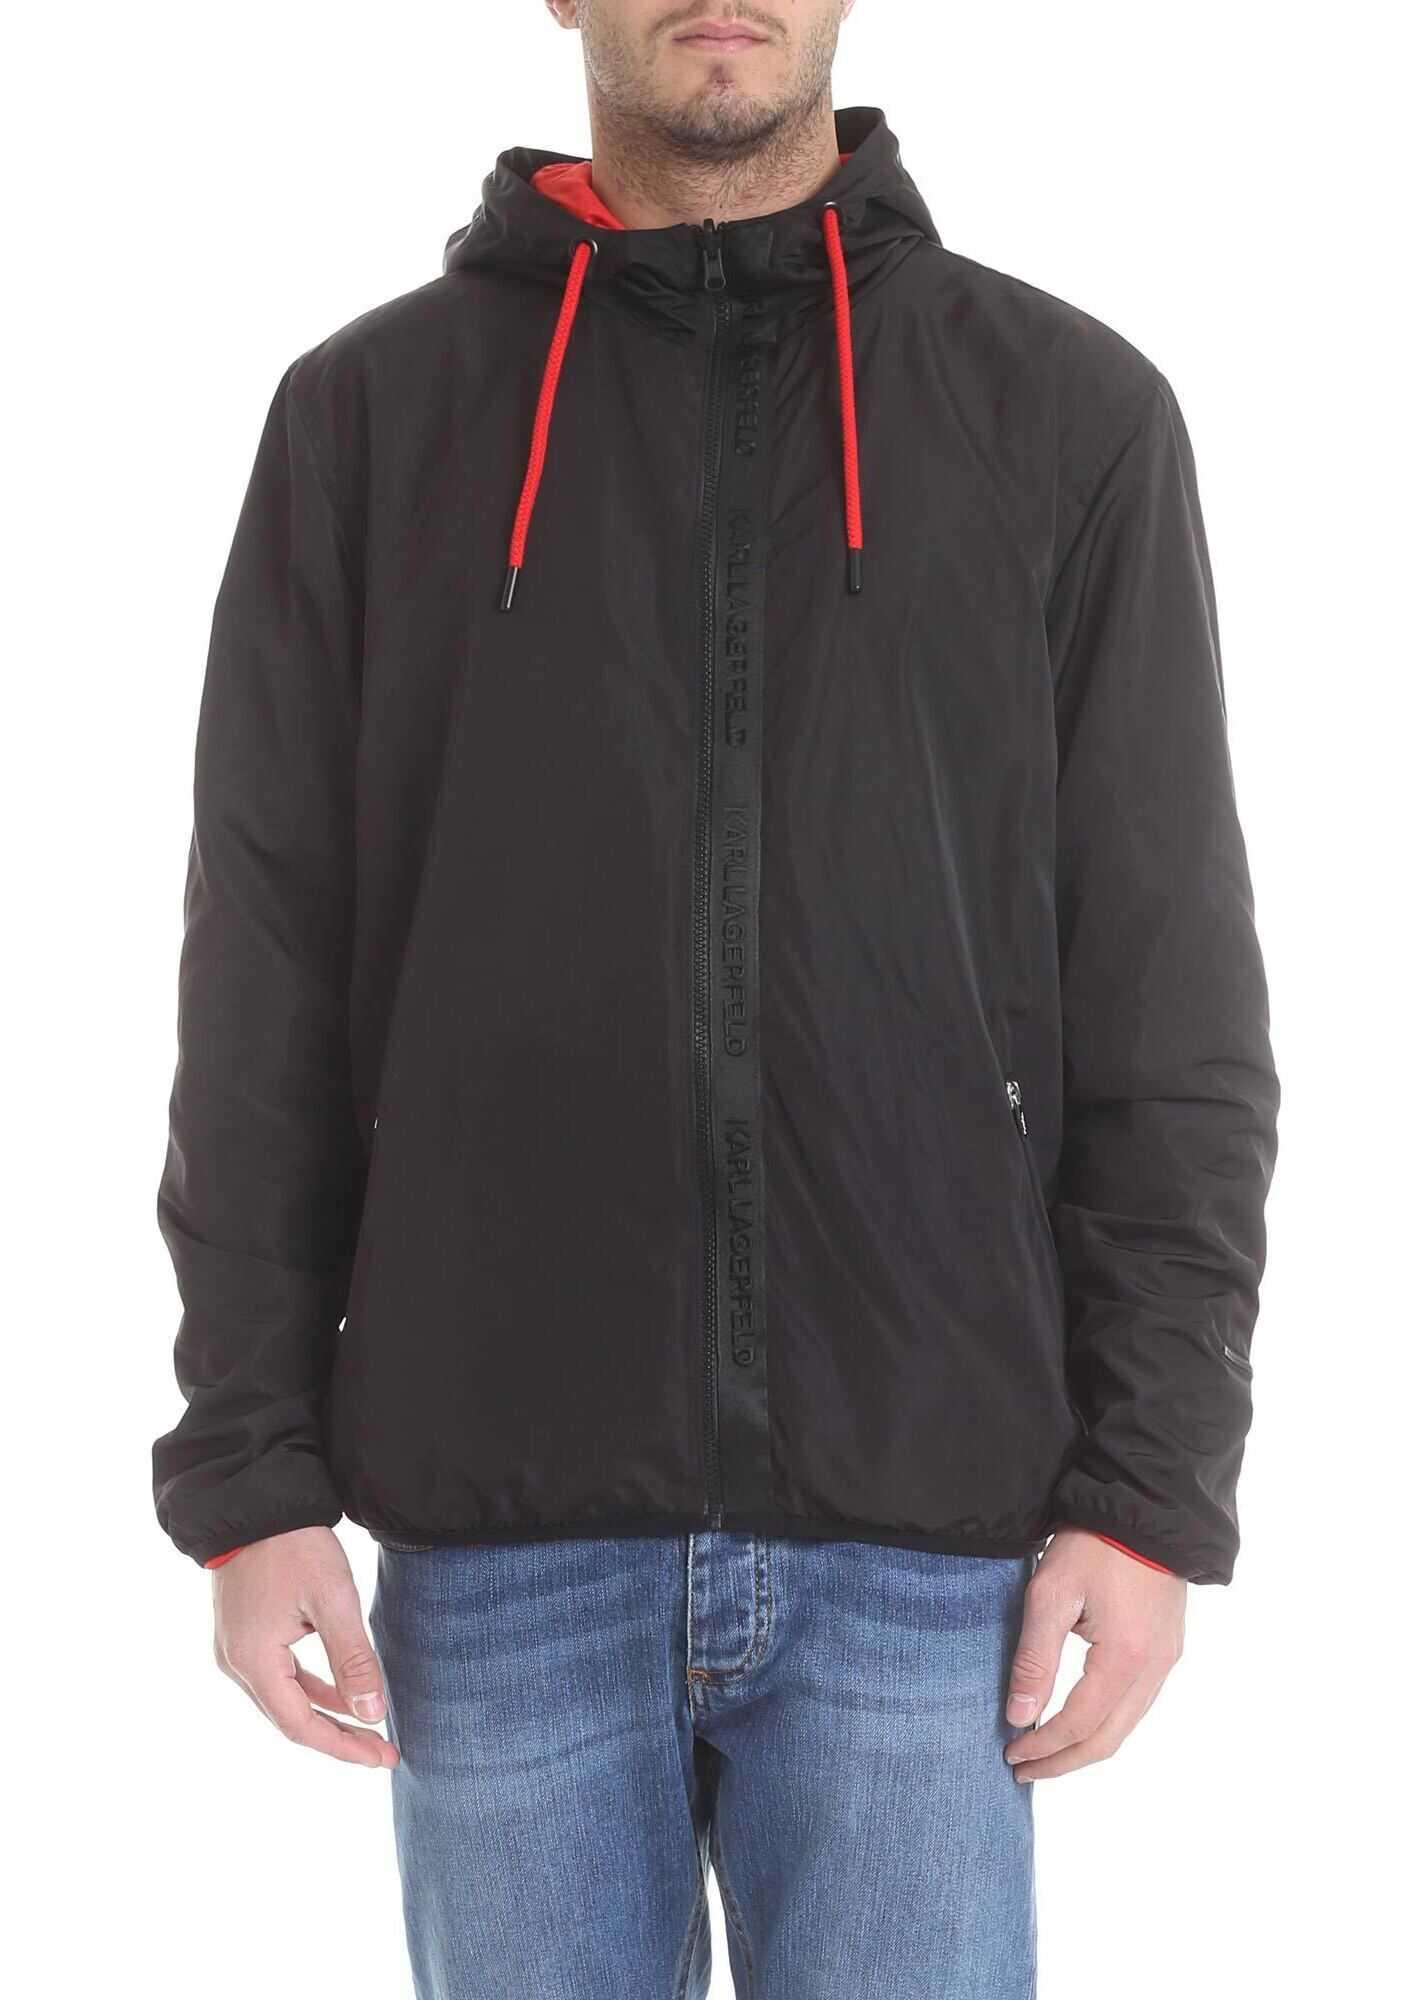 Karl Lagerfeld Reversible Jacket In Black Technical Fabric Black imagine